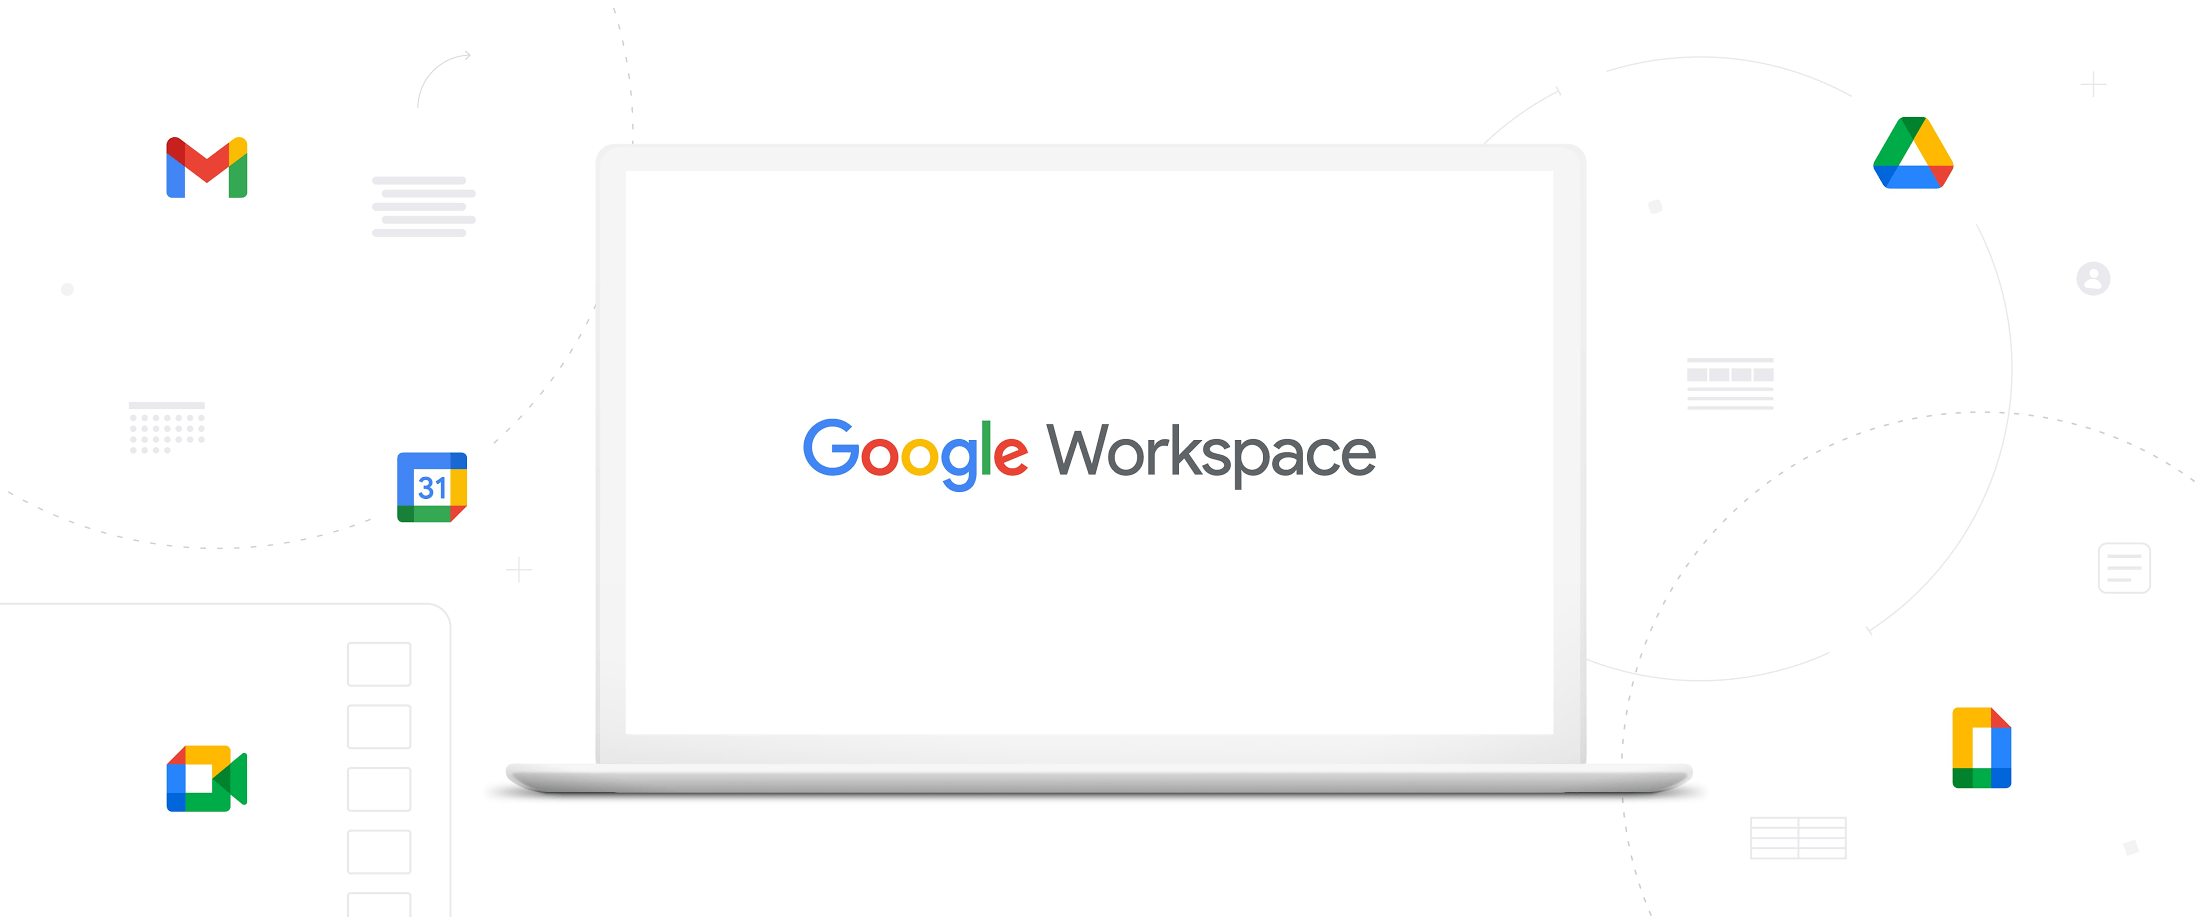 Google 法人向けサービスブランド「G Suite」を「Google Workspace」に刷新 | WORKPORT+